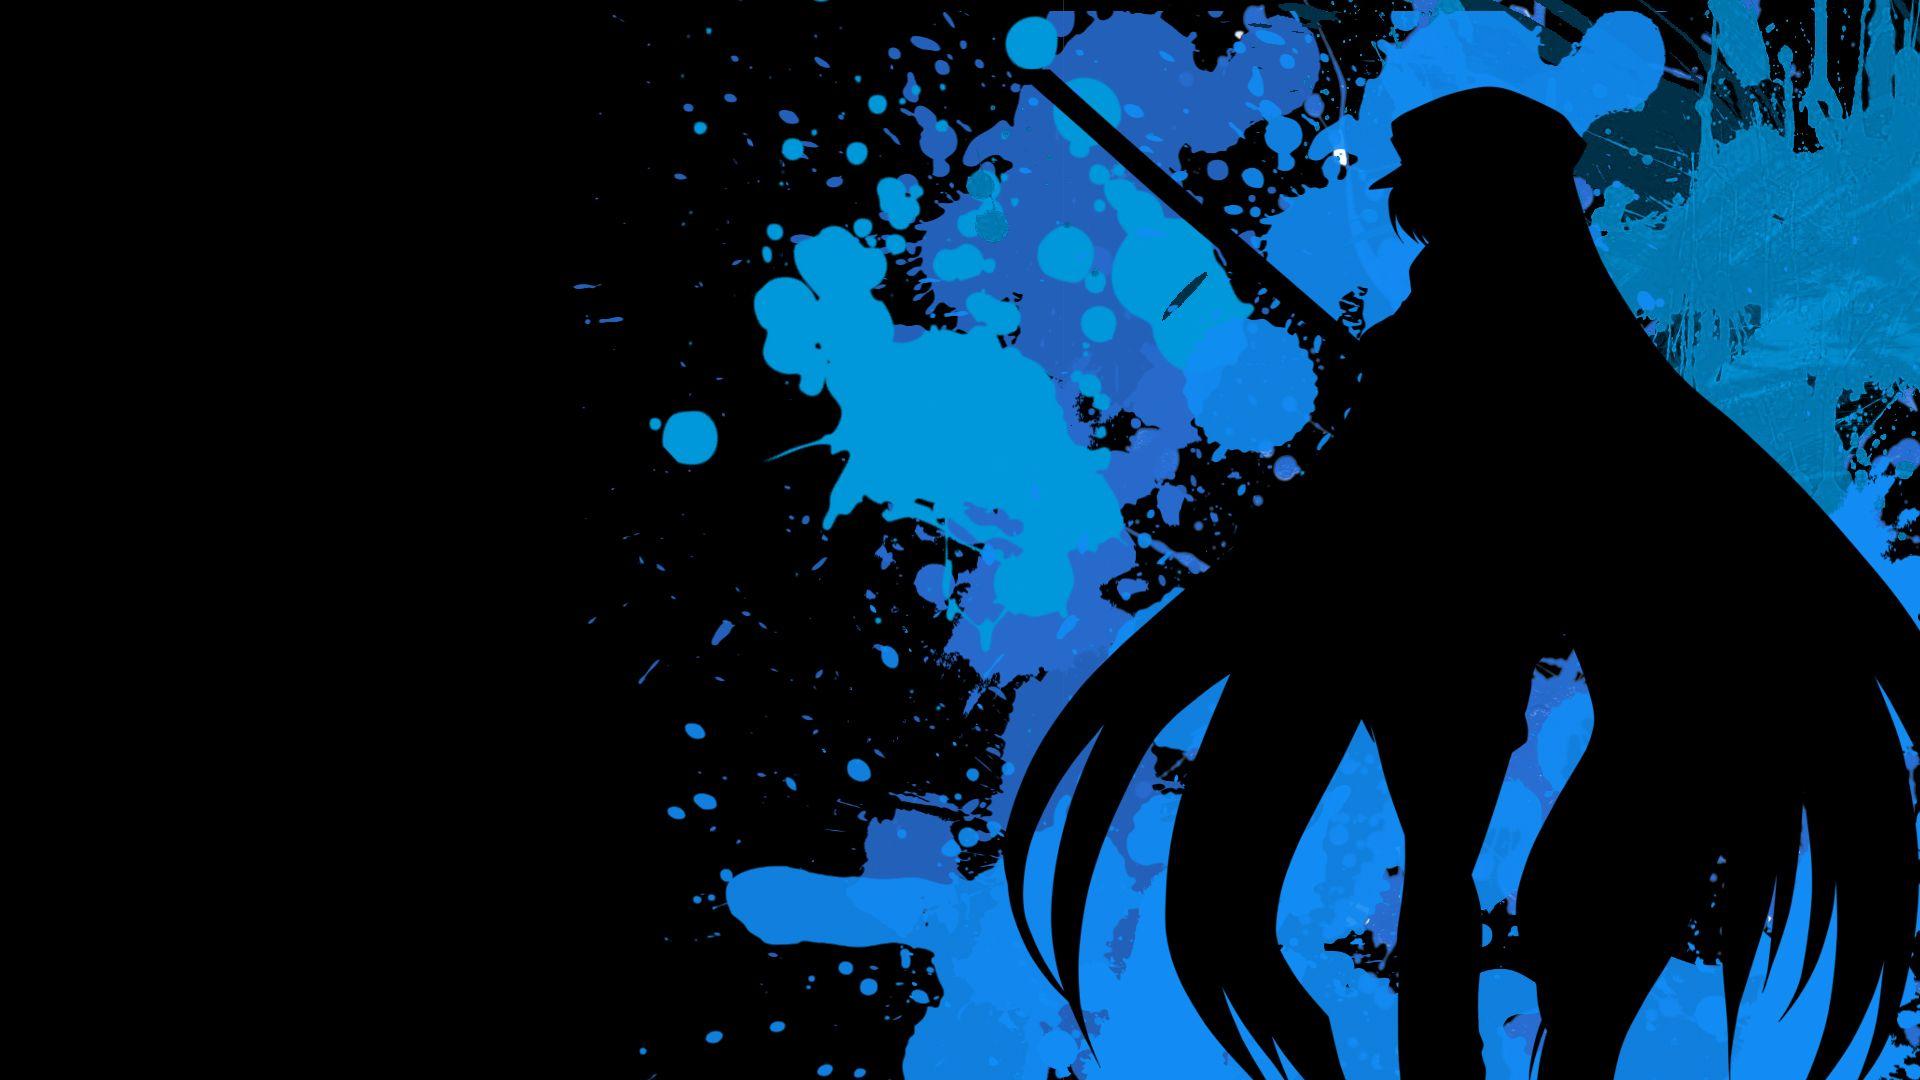 Esdese Silhouette Akame Ga Kill Esdeath Wallpaper (avec